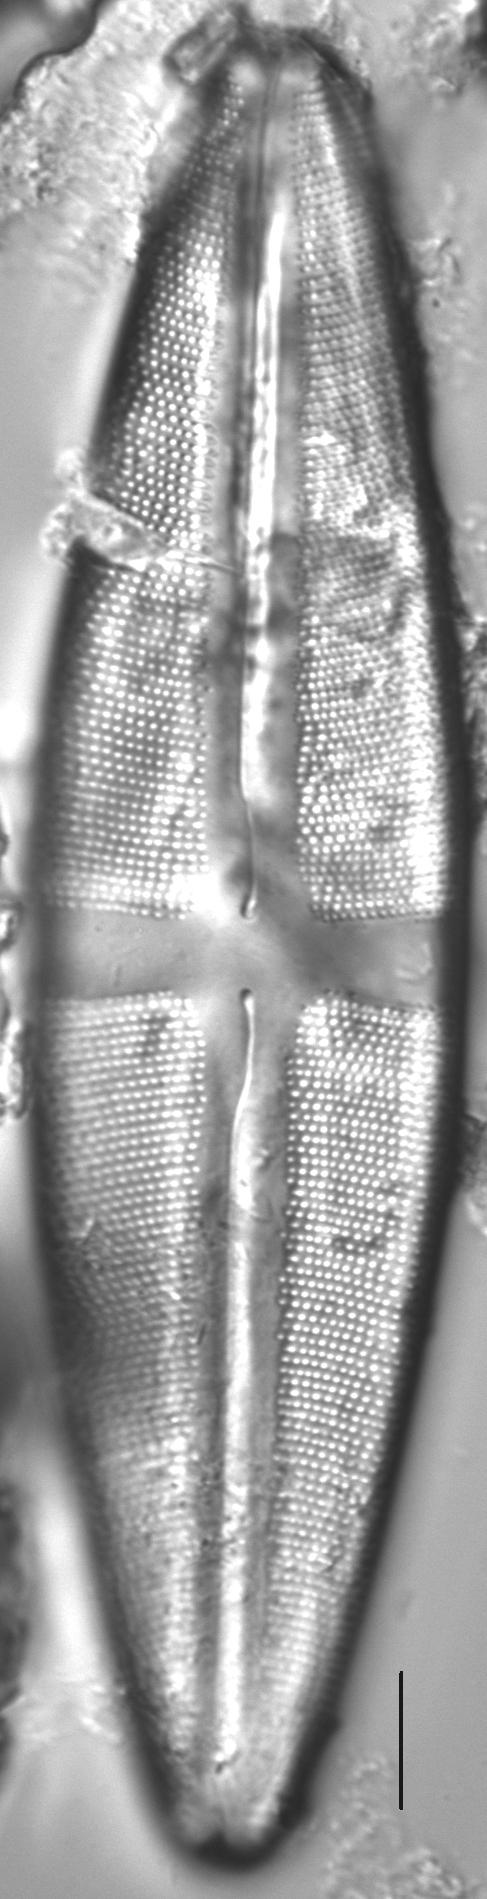 Stauroneis americana LM1